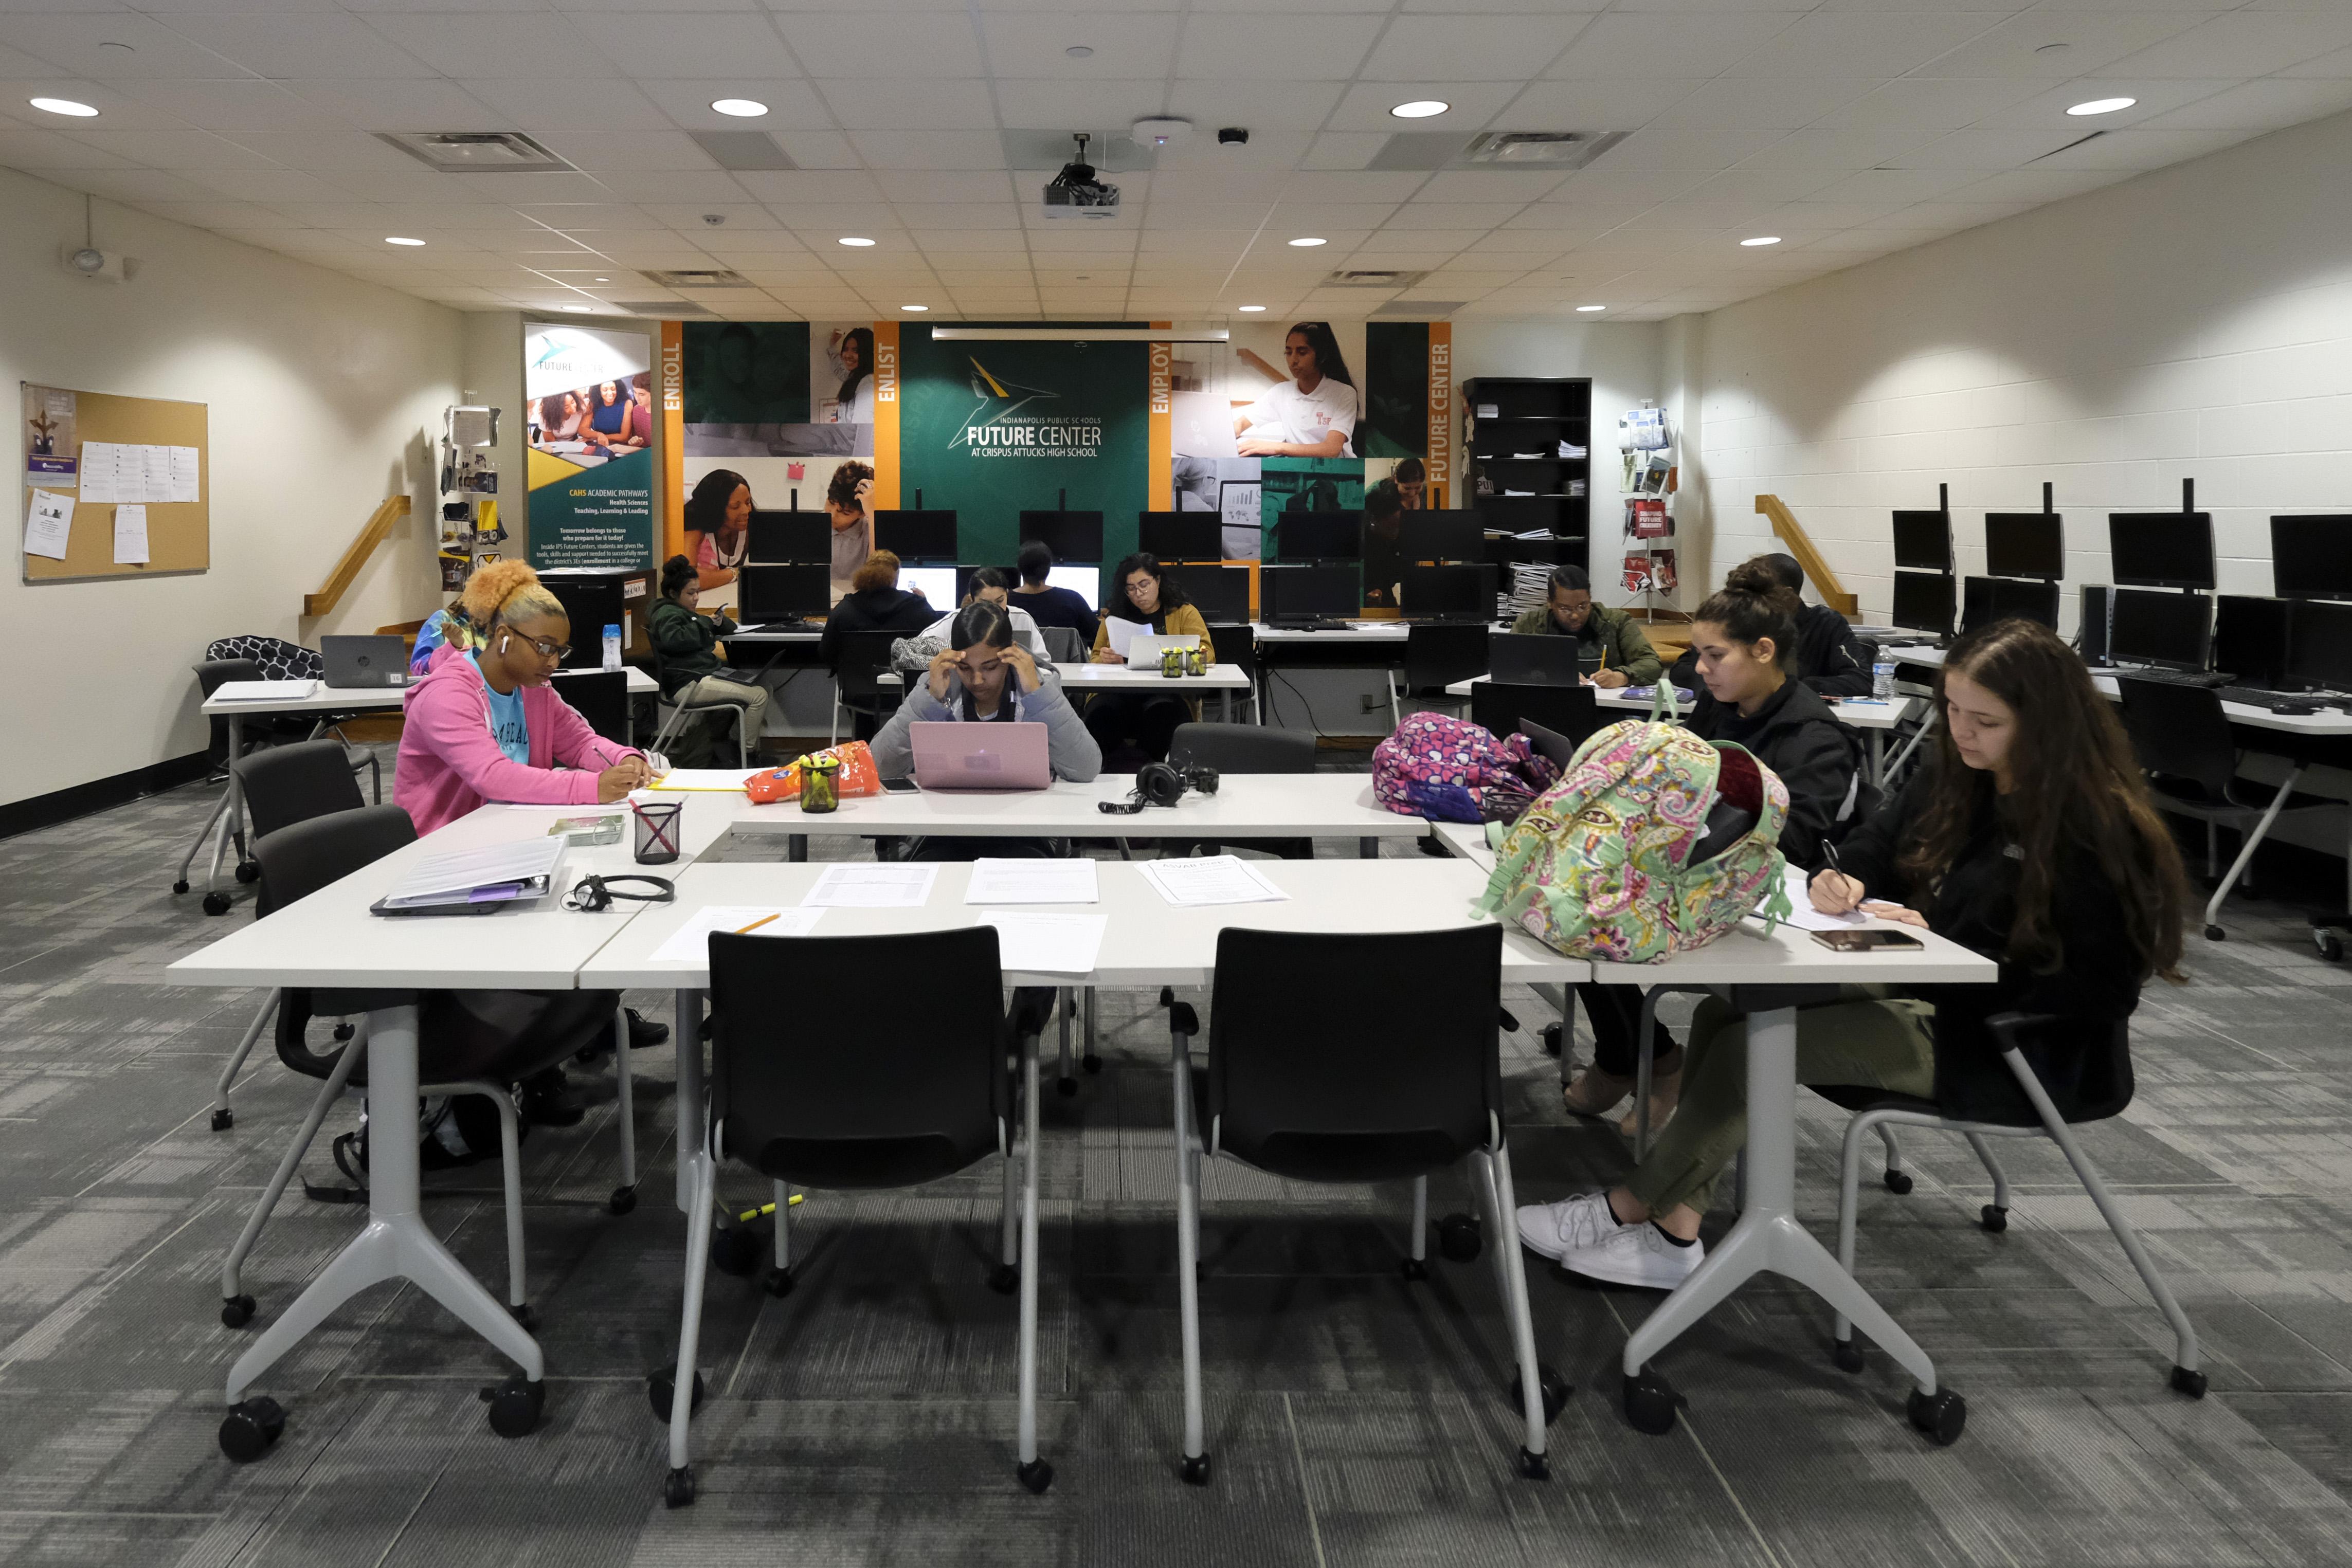 Students in a classroom at Crispus Attucks High School.